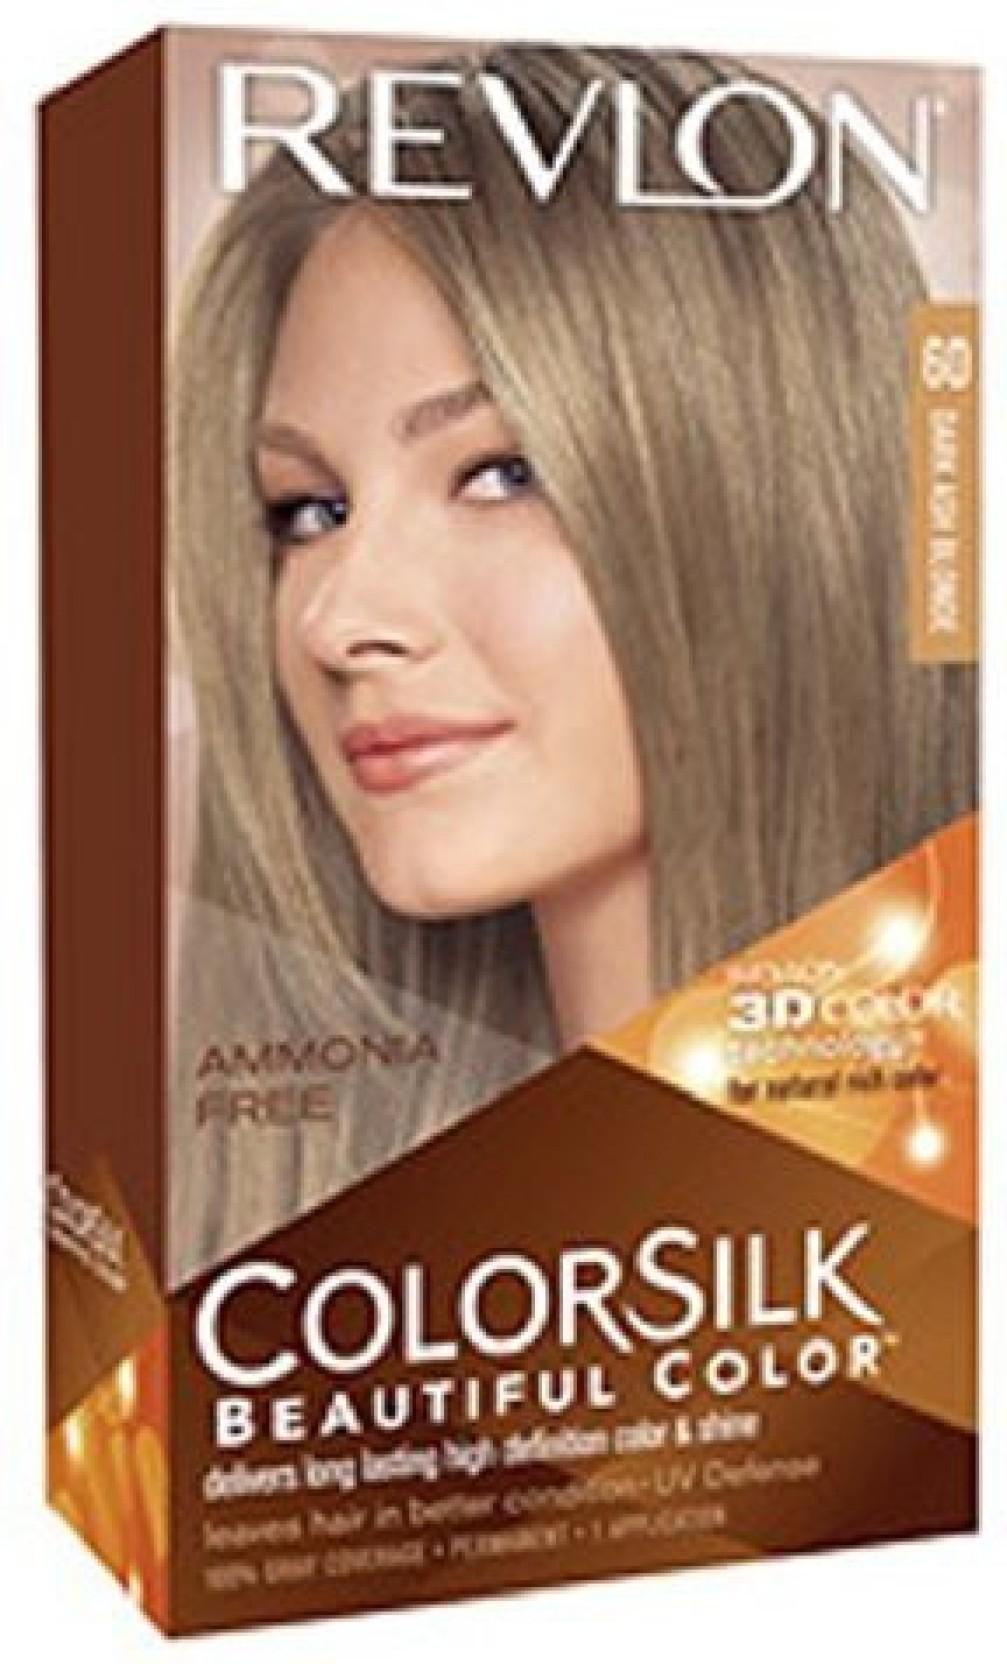 Revlon Colorsilk Beautiful Color Dark Ash Blonde Hair Color Price